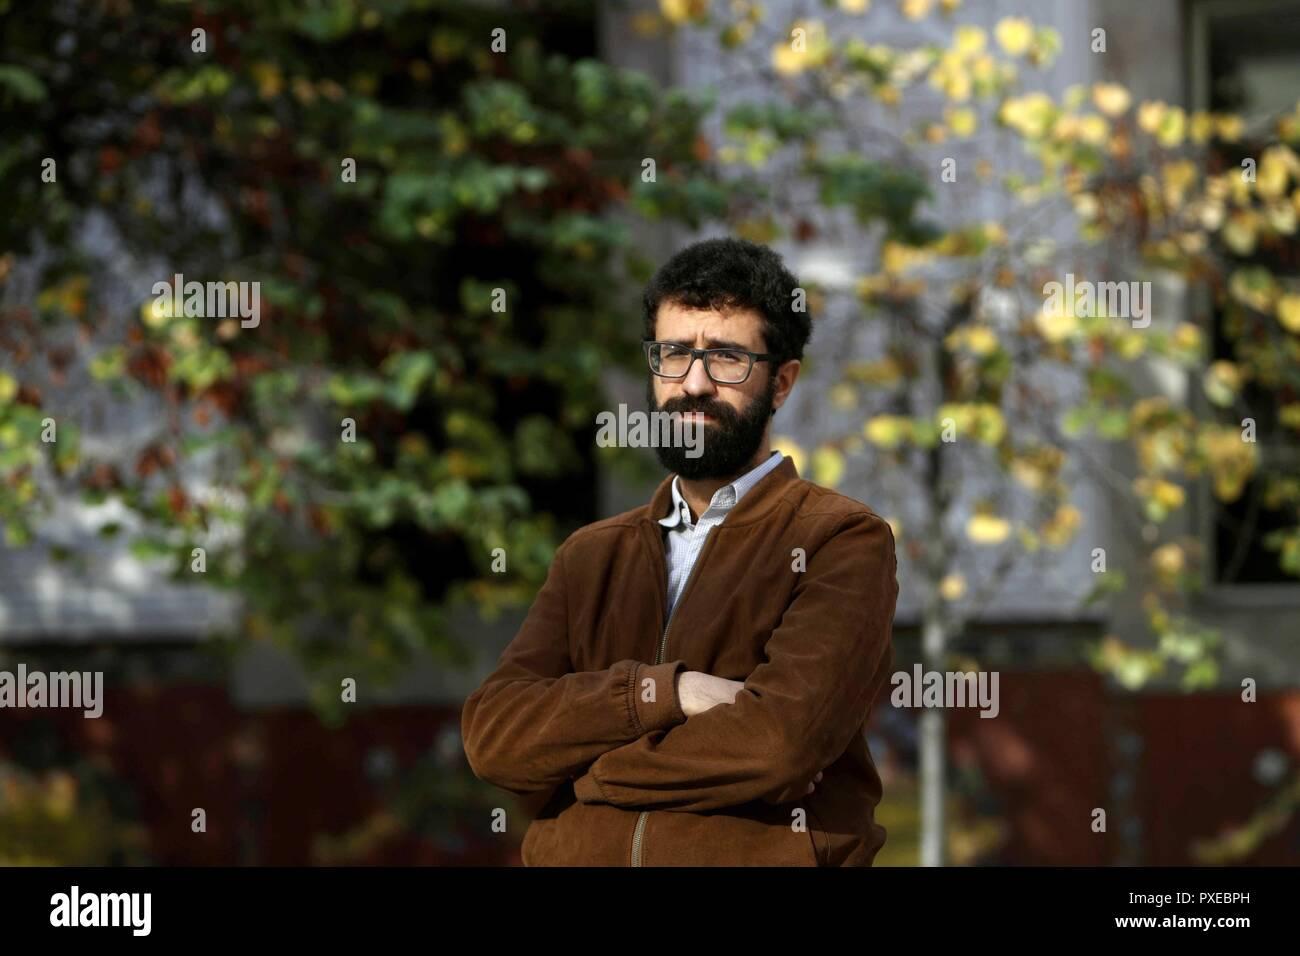 Barcelona, Spain  22nd Oct, 2018  French writer Sabri Louatah poses